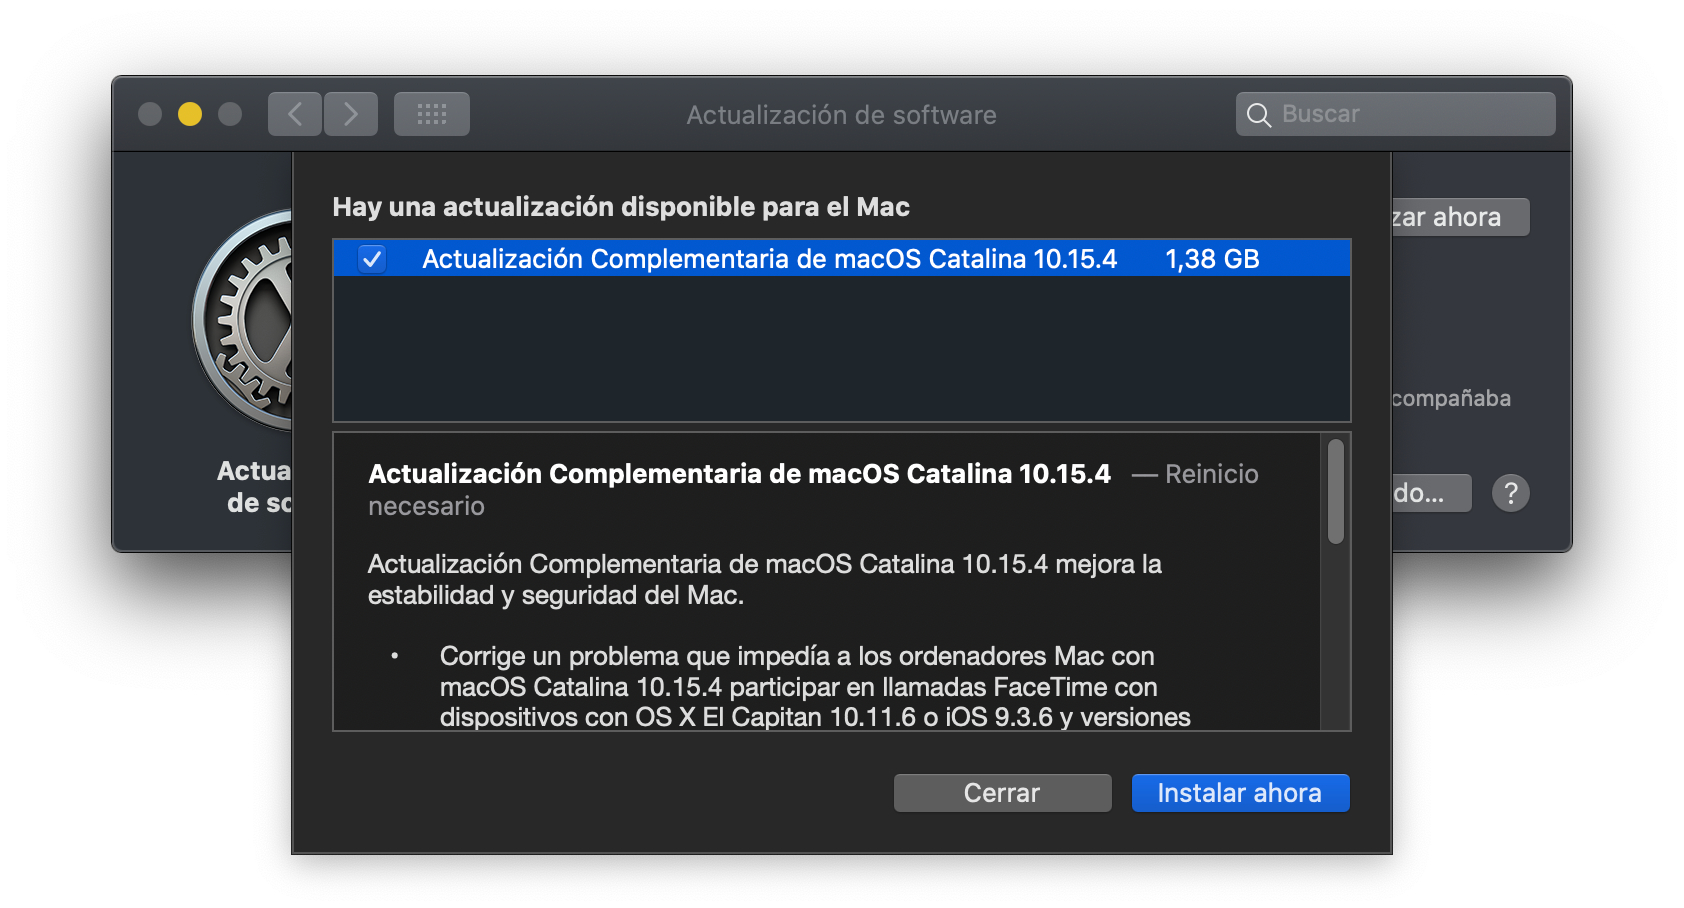 Actualización Complementaria de macOS Catalina 10.15.4